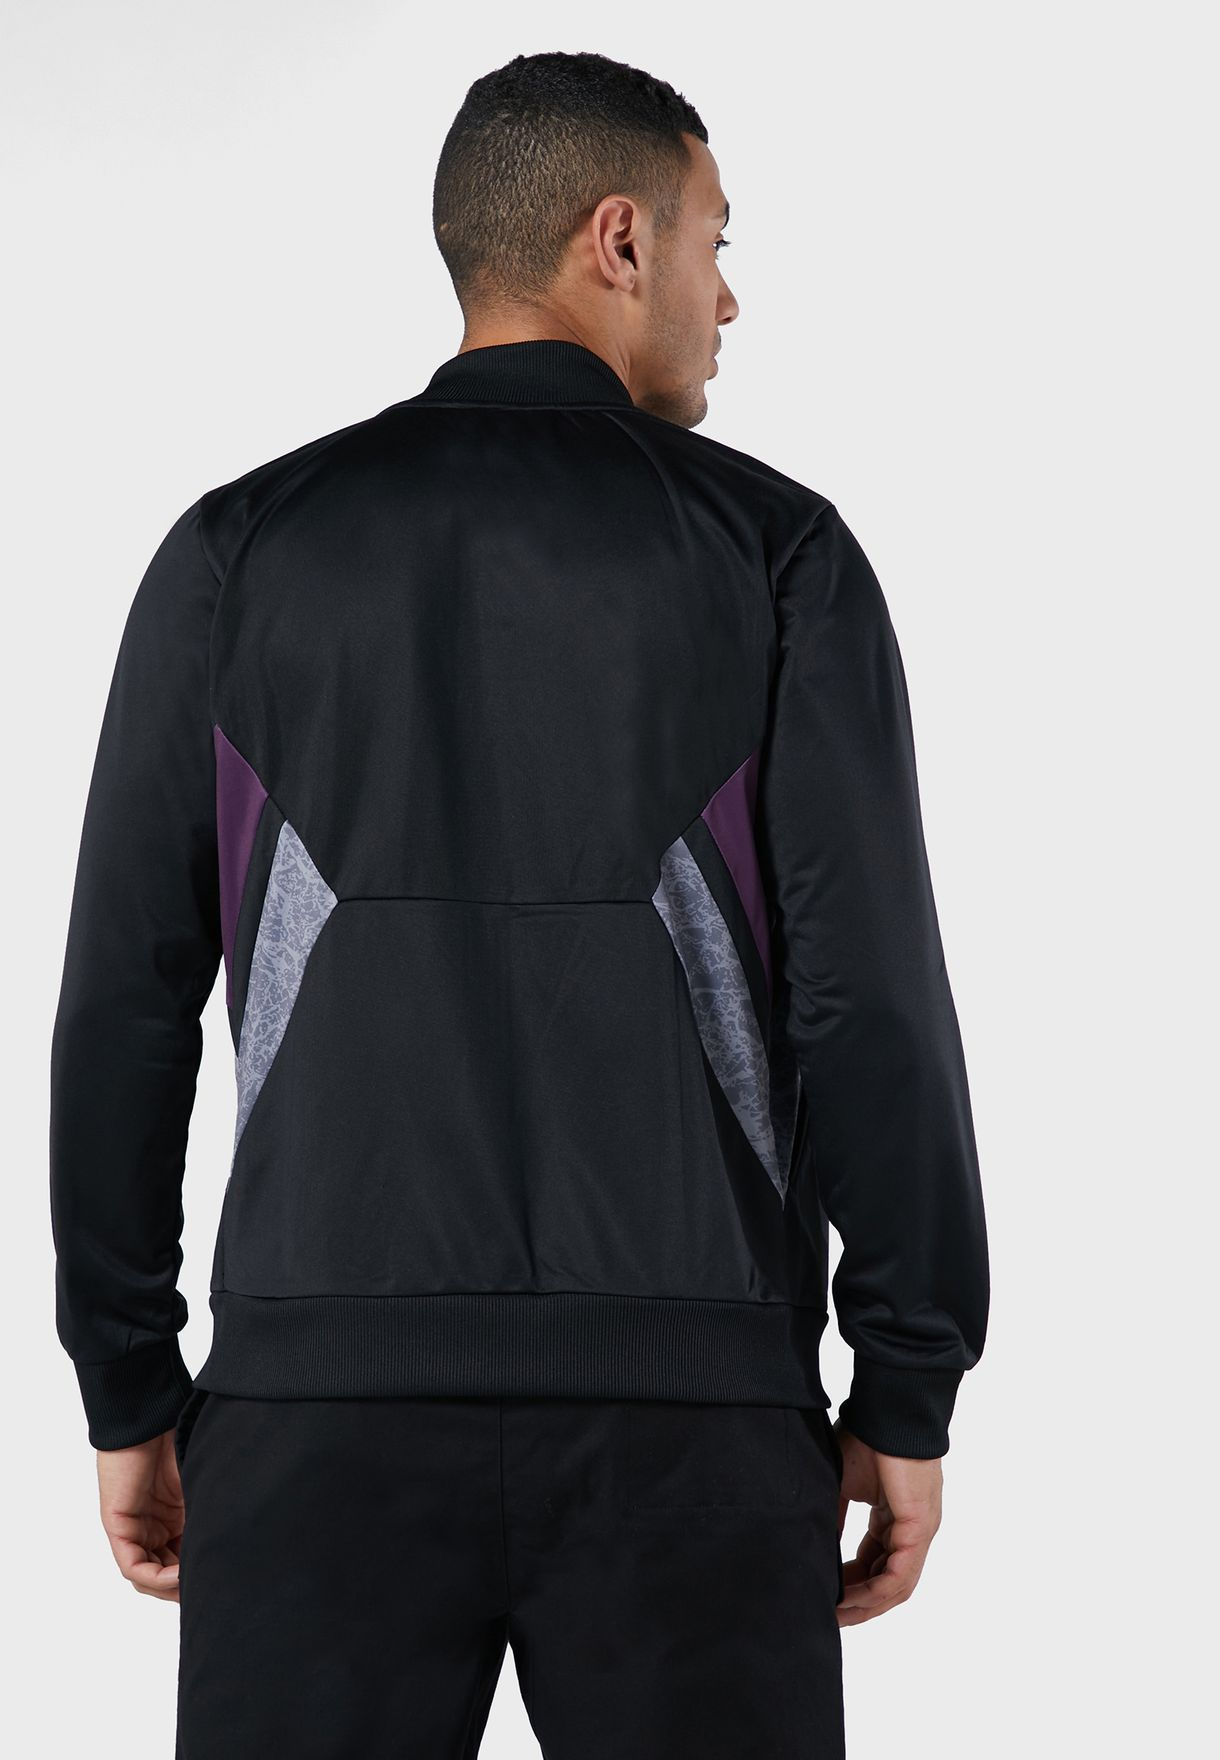 Ventura Tricot Jacket